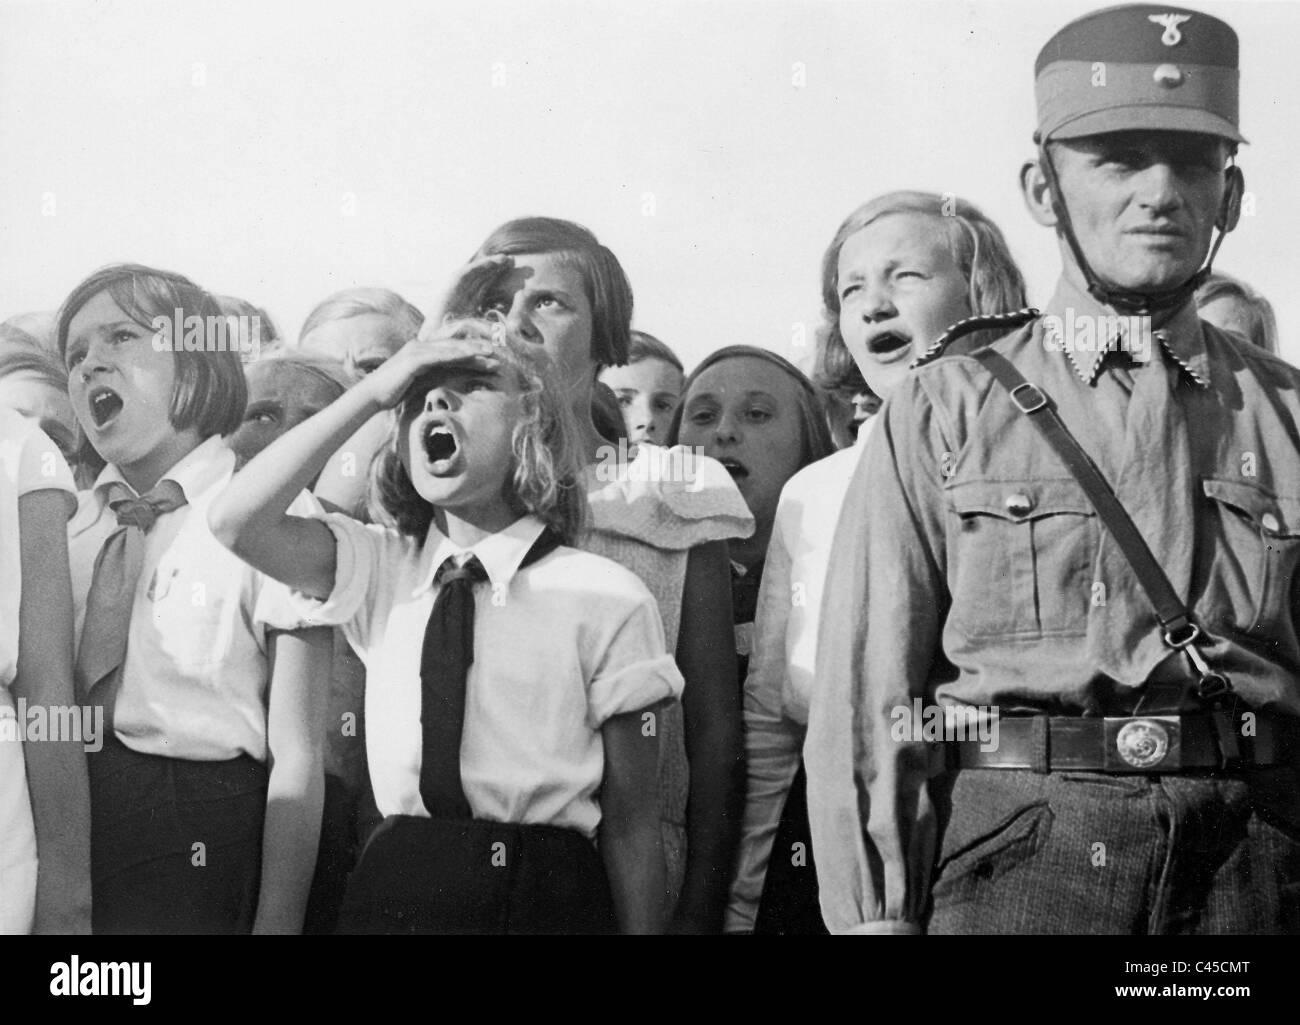 WW2 Picture Photo Member Young women Bund Deutscher Mädel